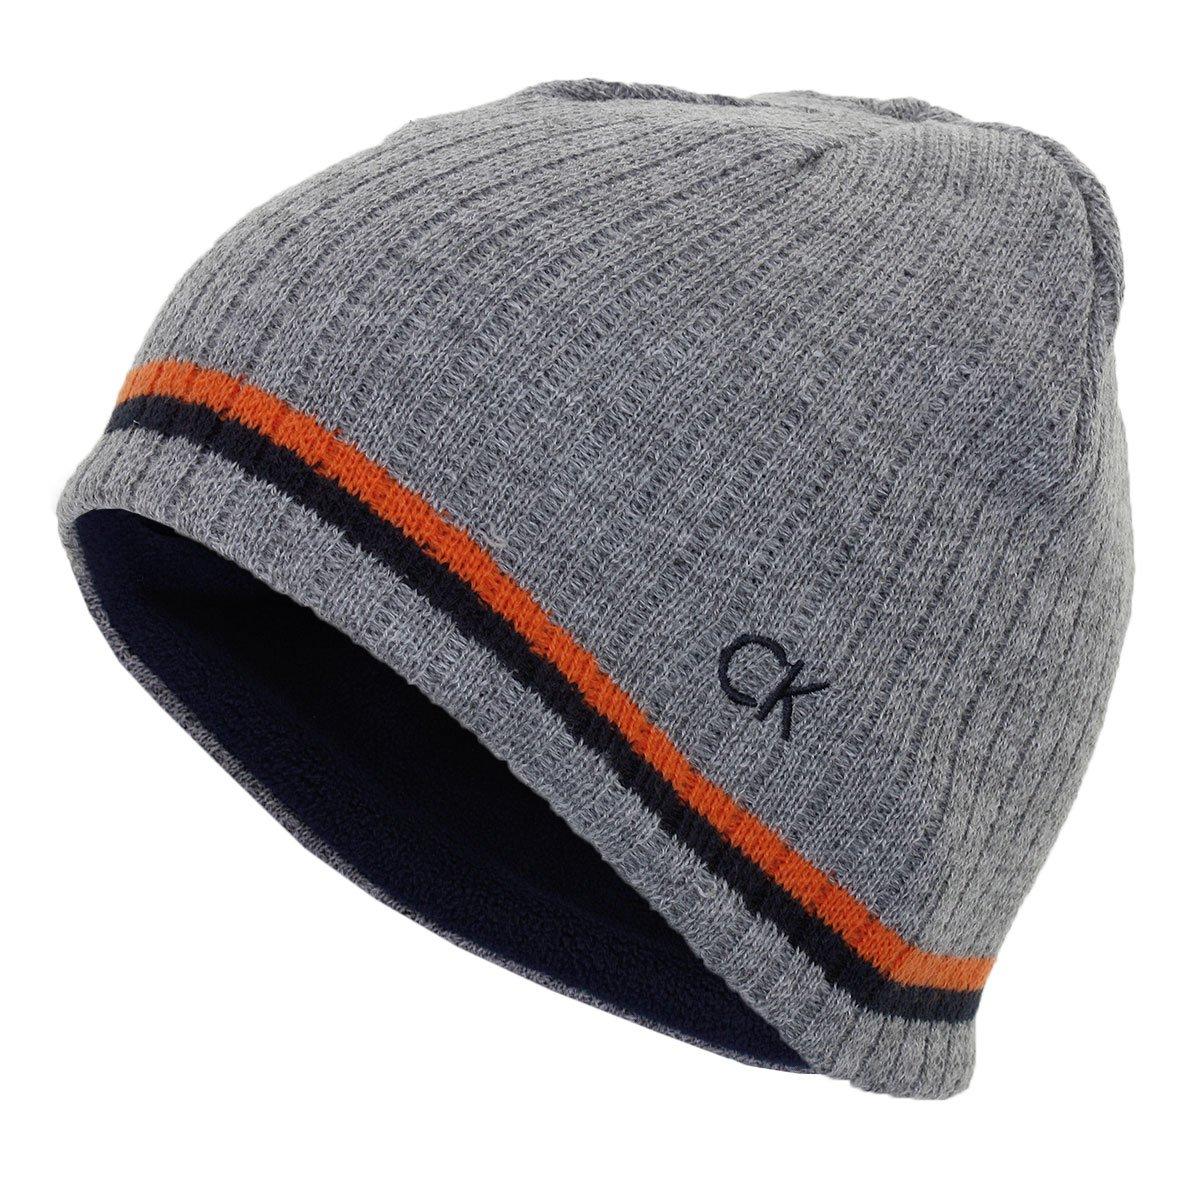 5867ec23af4 Calvin Klein Golf Mens Reversible Knit Beanie - Grey Marl - One Size   Amazon.co.uk  Clothing